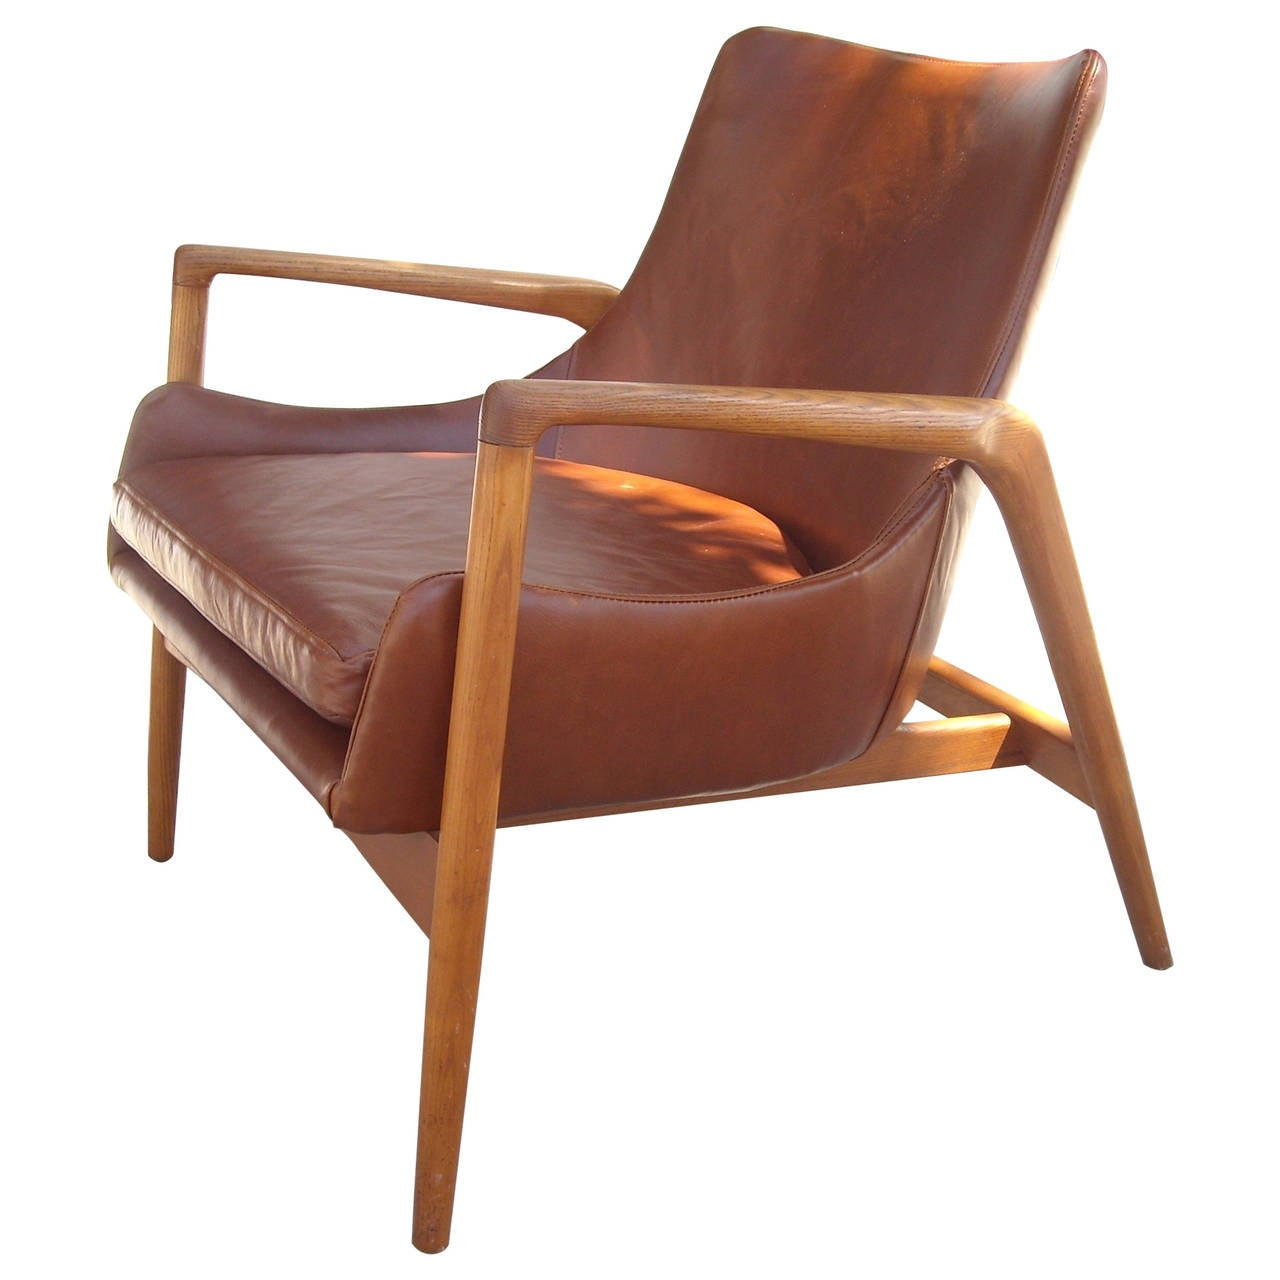 Ib Kofod-Larsen Denmark Mid-Century Easy Lounge Chair, Oak, Leather